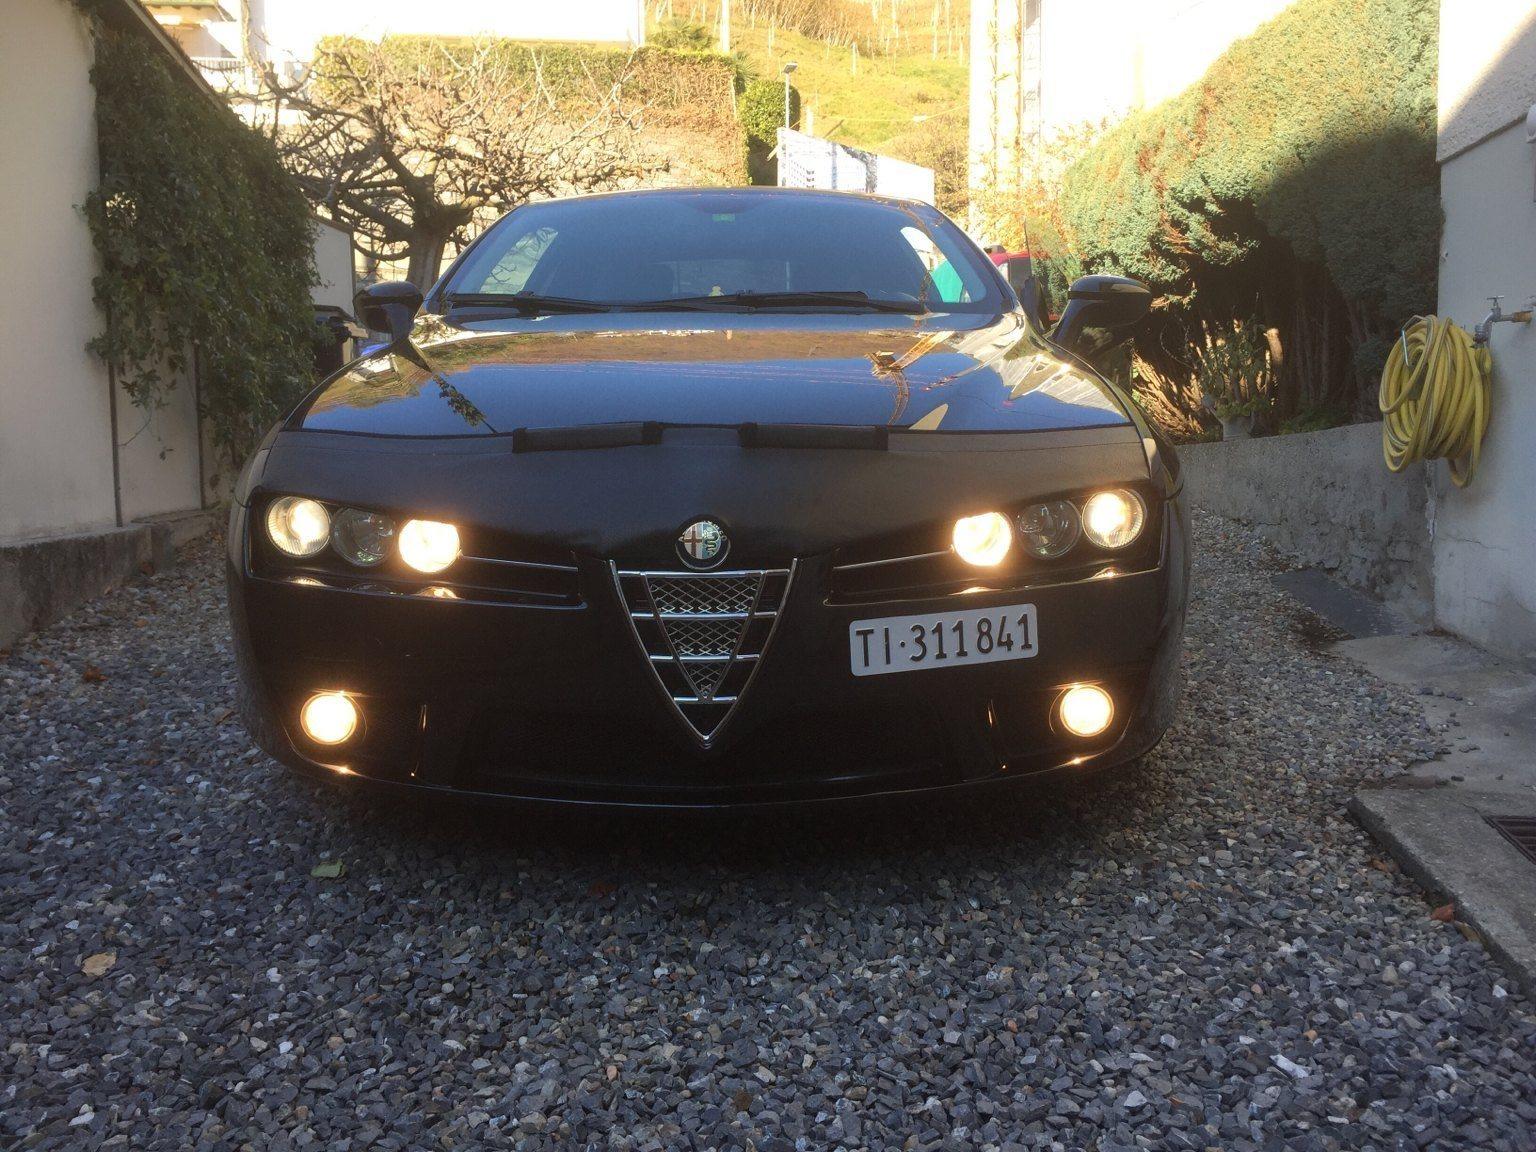 foto Alfa Romeo Brera - 2.2 jts 185cv - 4